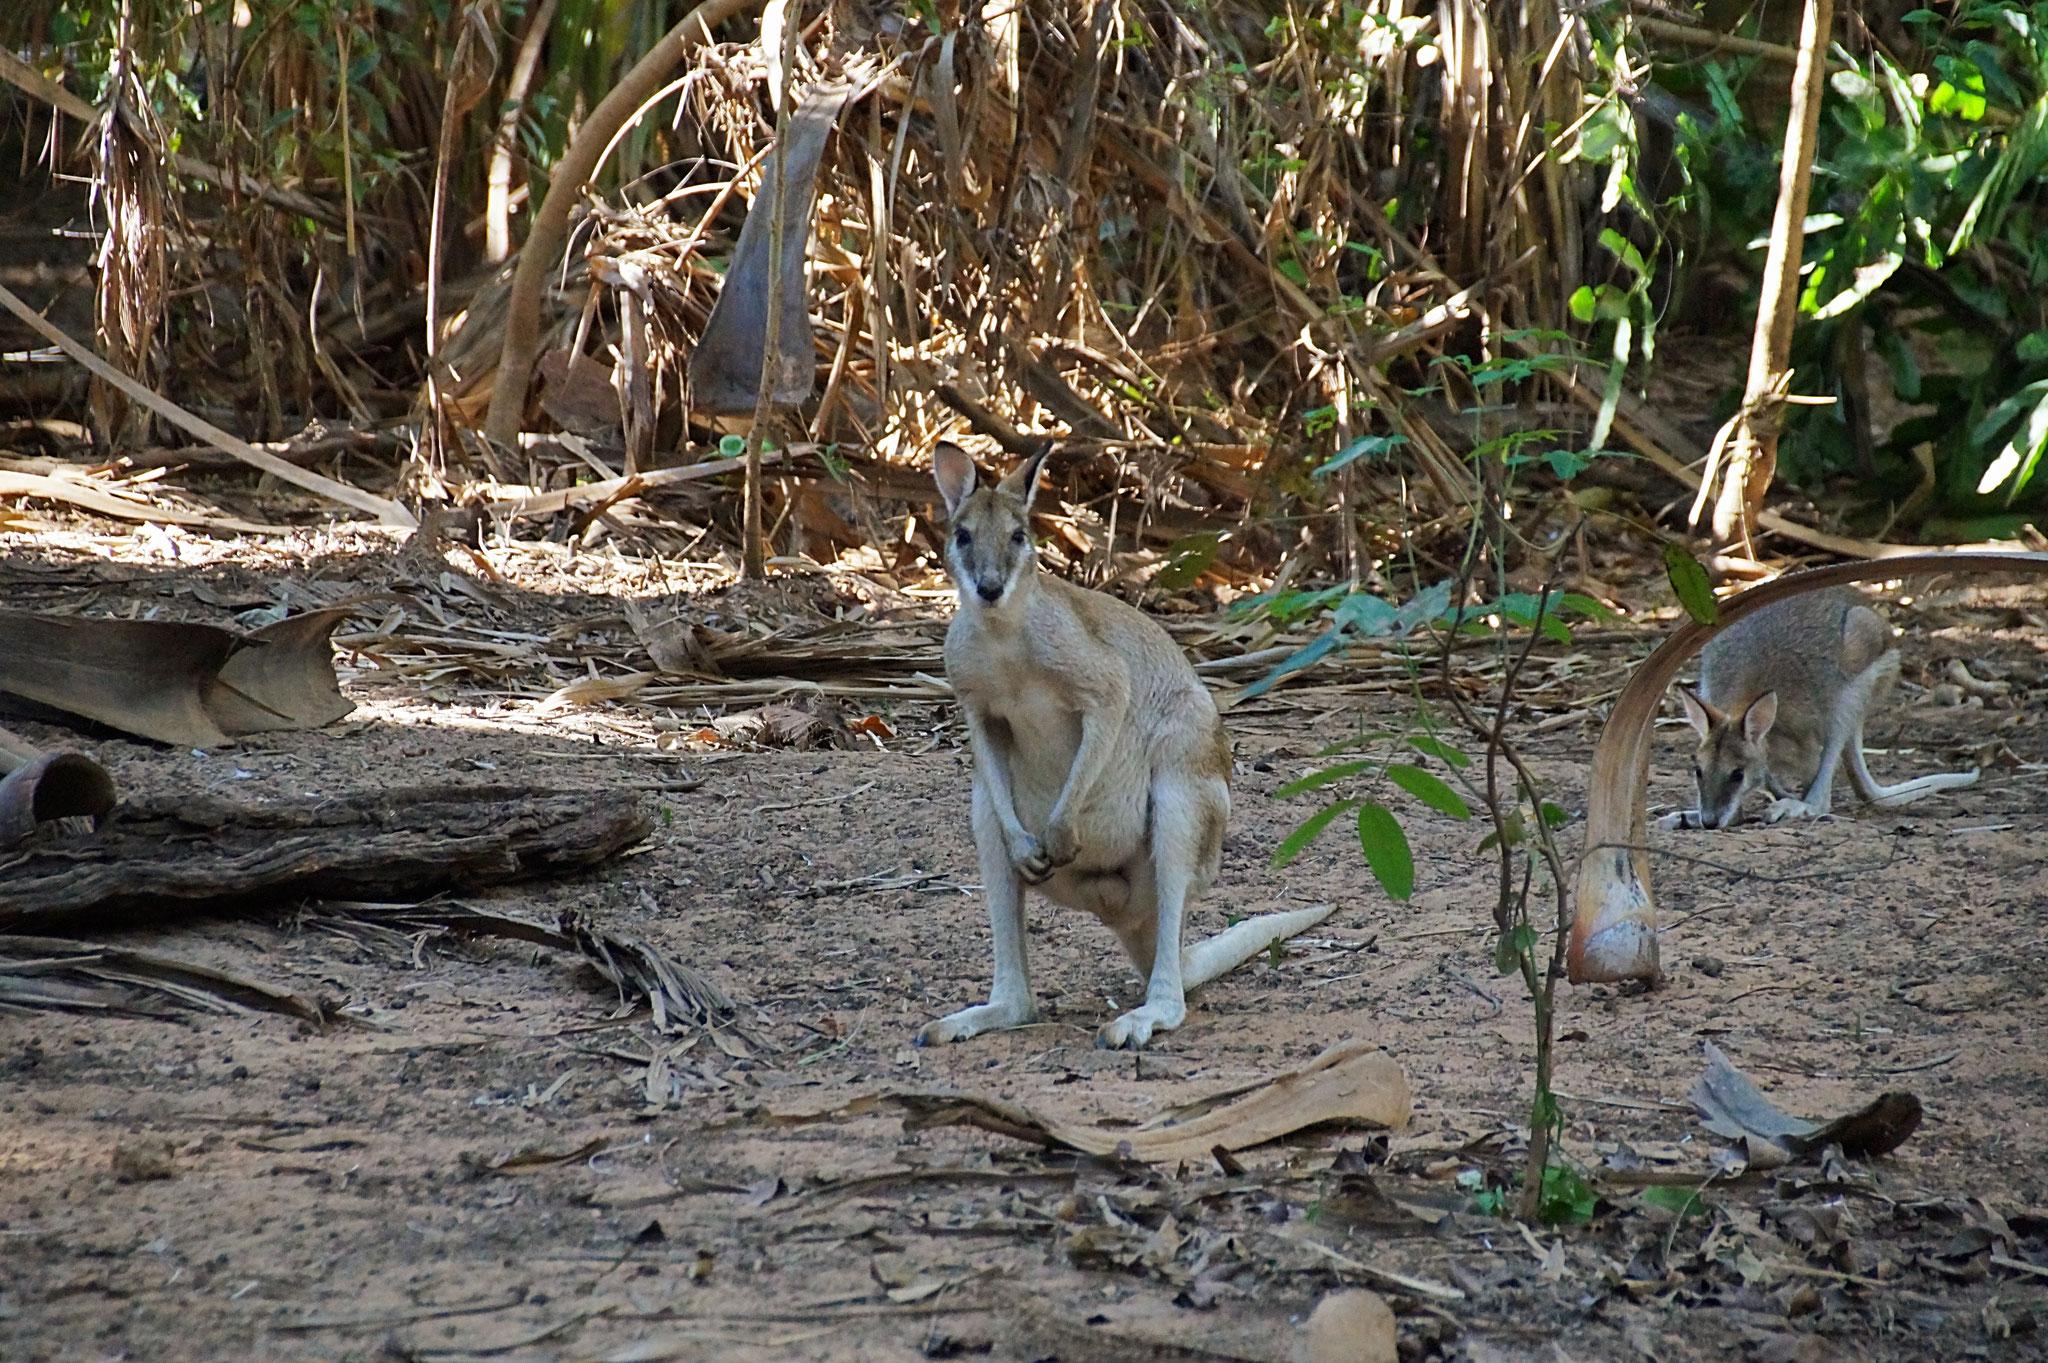 Das Känguru war so neugierig wie wir.